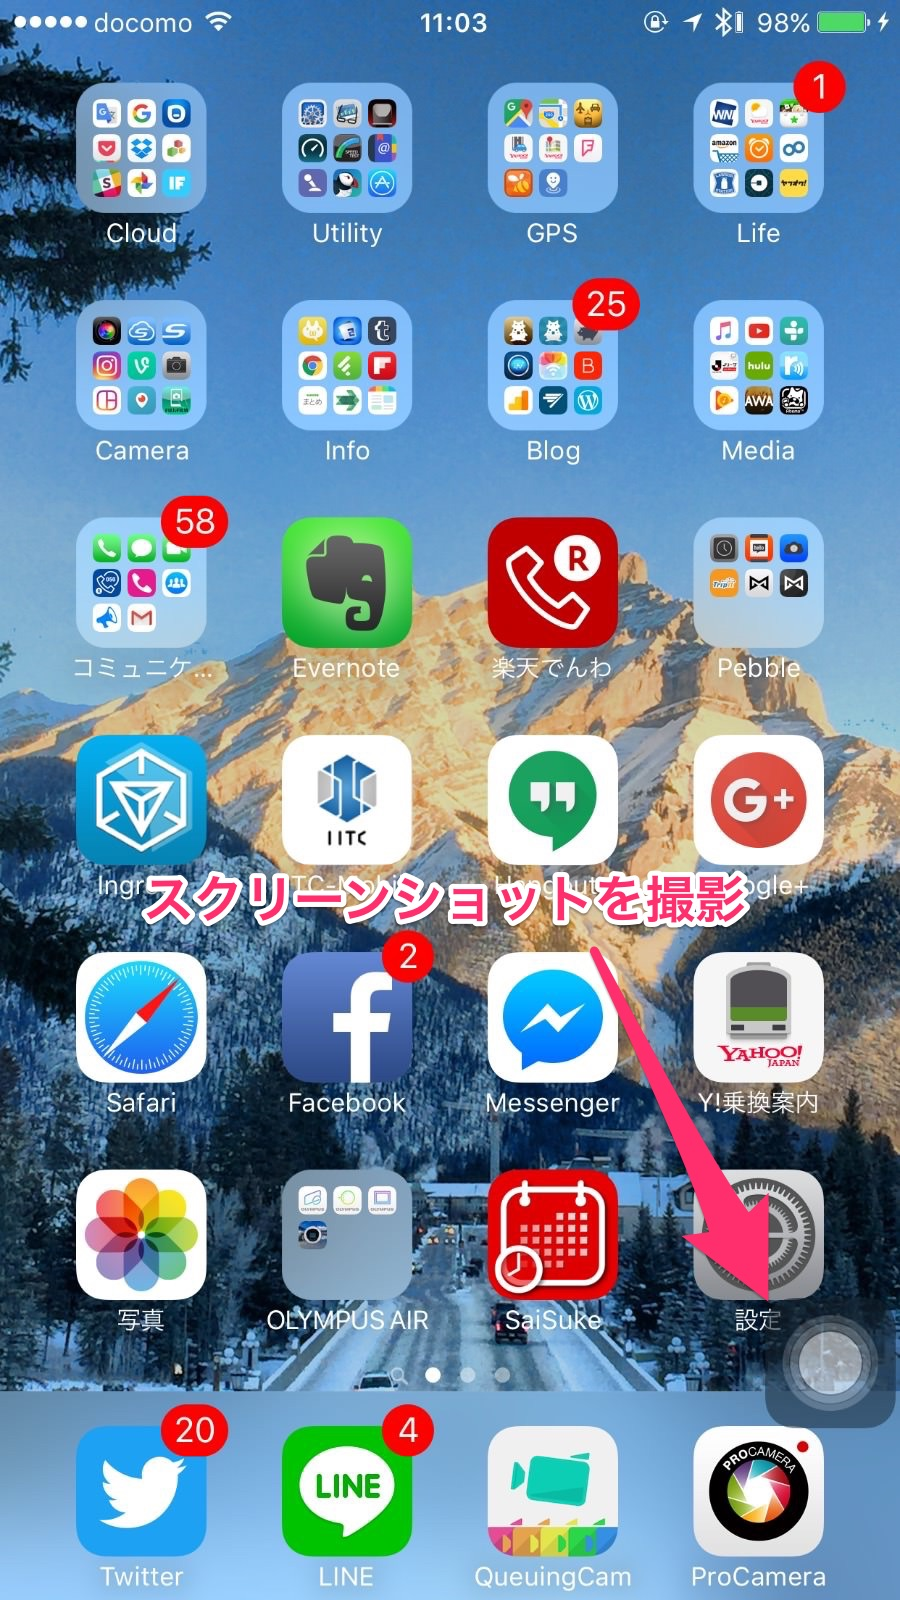 【iPhone】1タップでスクリーンショットを撮影する方法